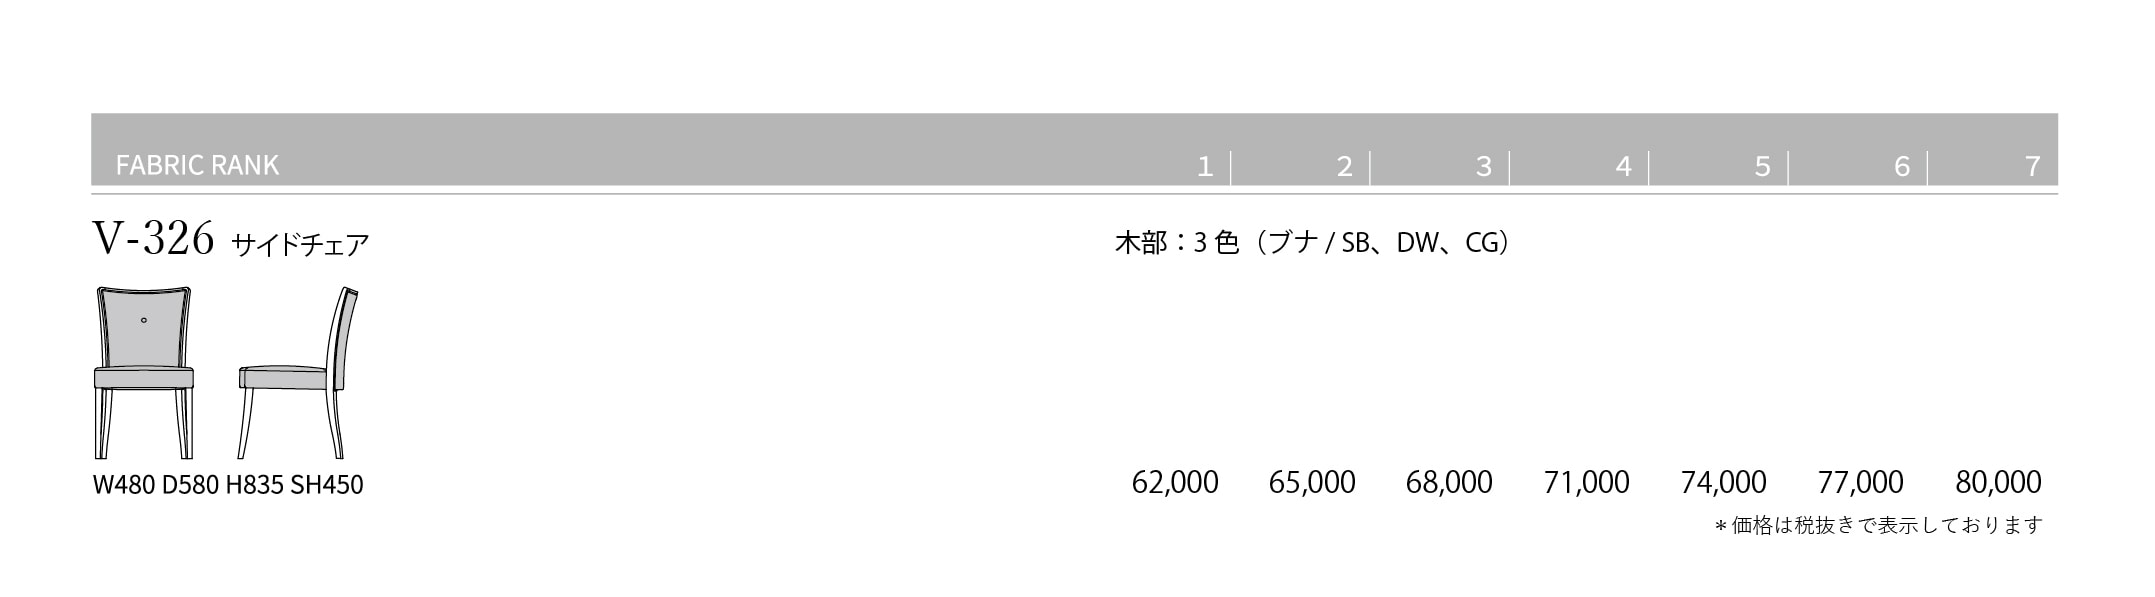 V-326 Price List